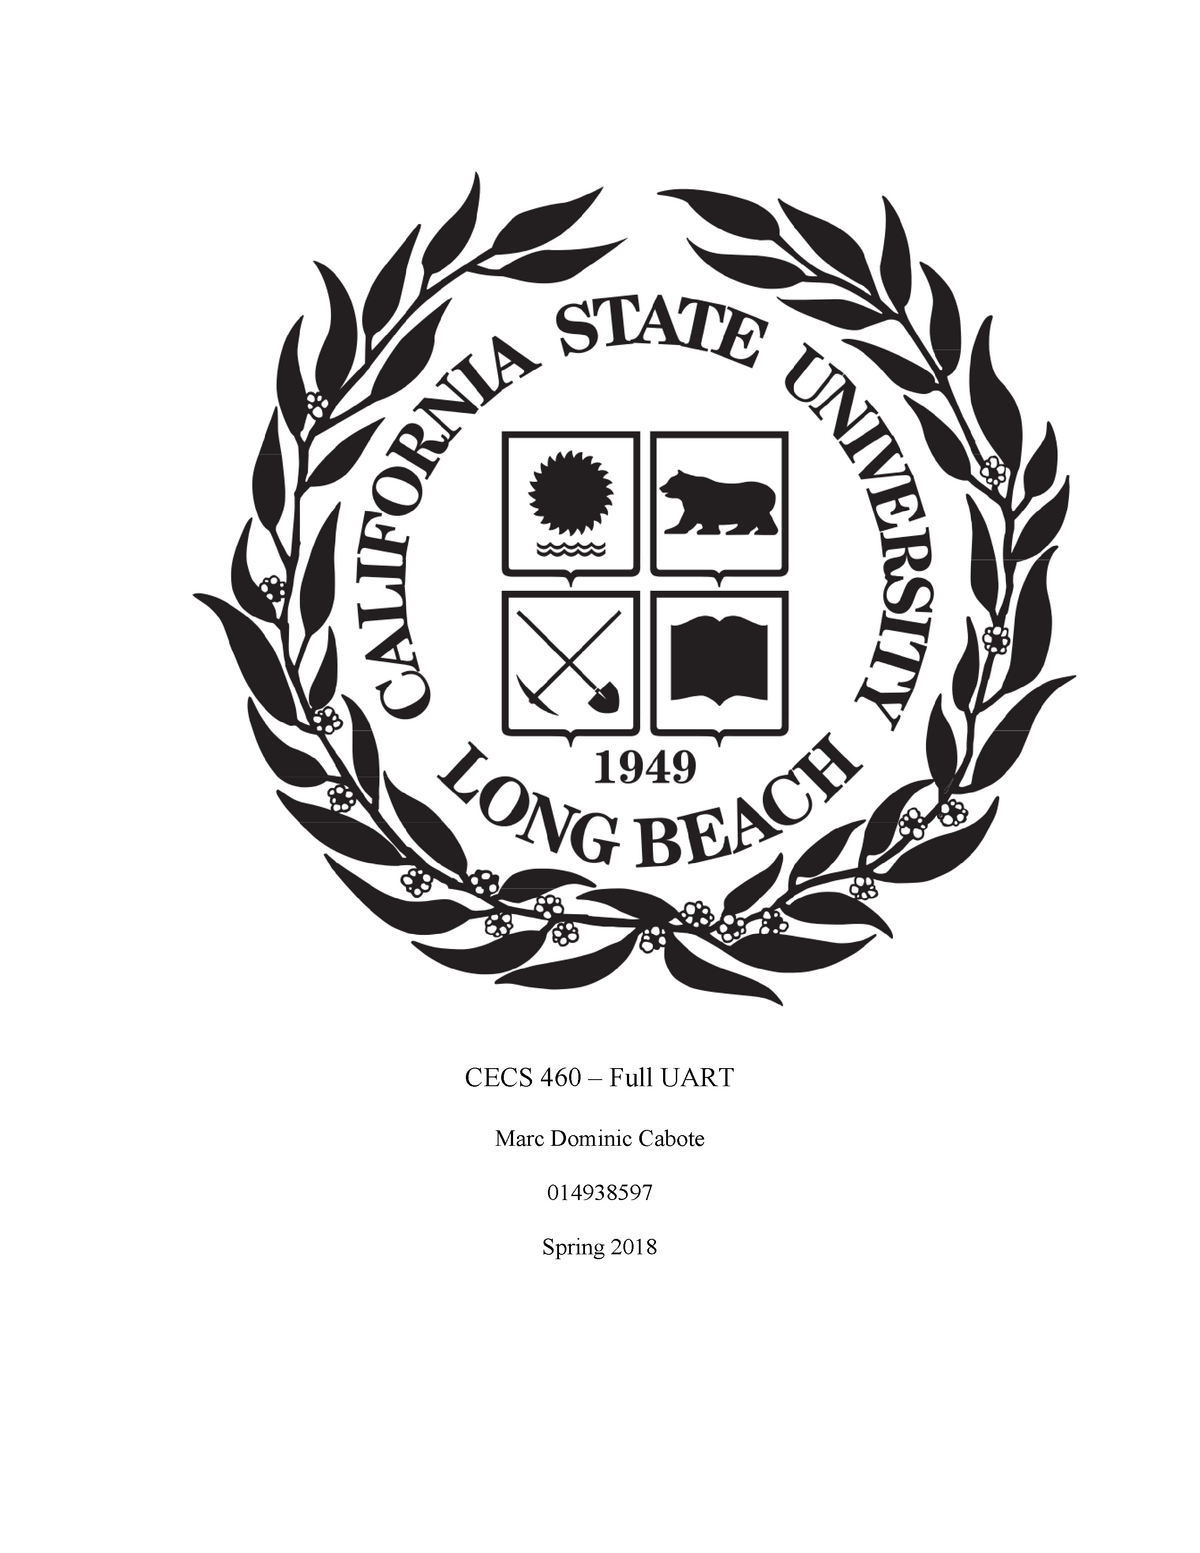 Uart Spec - UART specifications - CECS 460H - CSULB - StuDocu